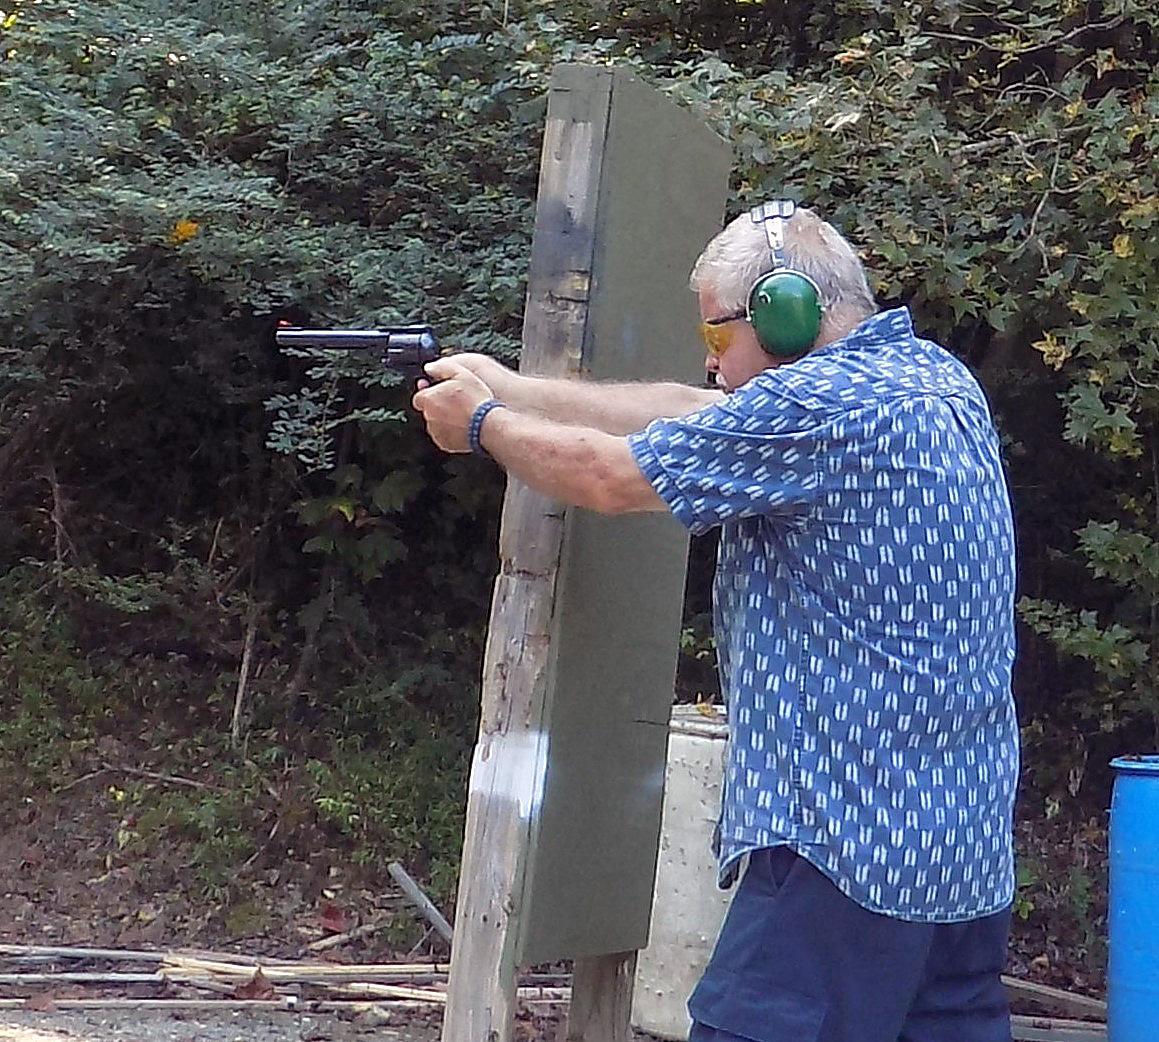 Handloading Cowboy Handgun Calibers - The Shooter's Log